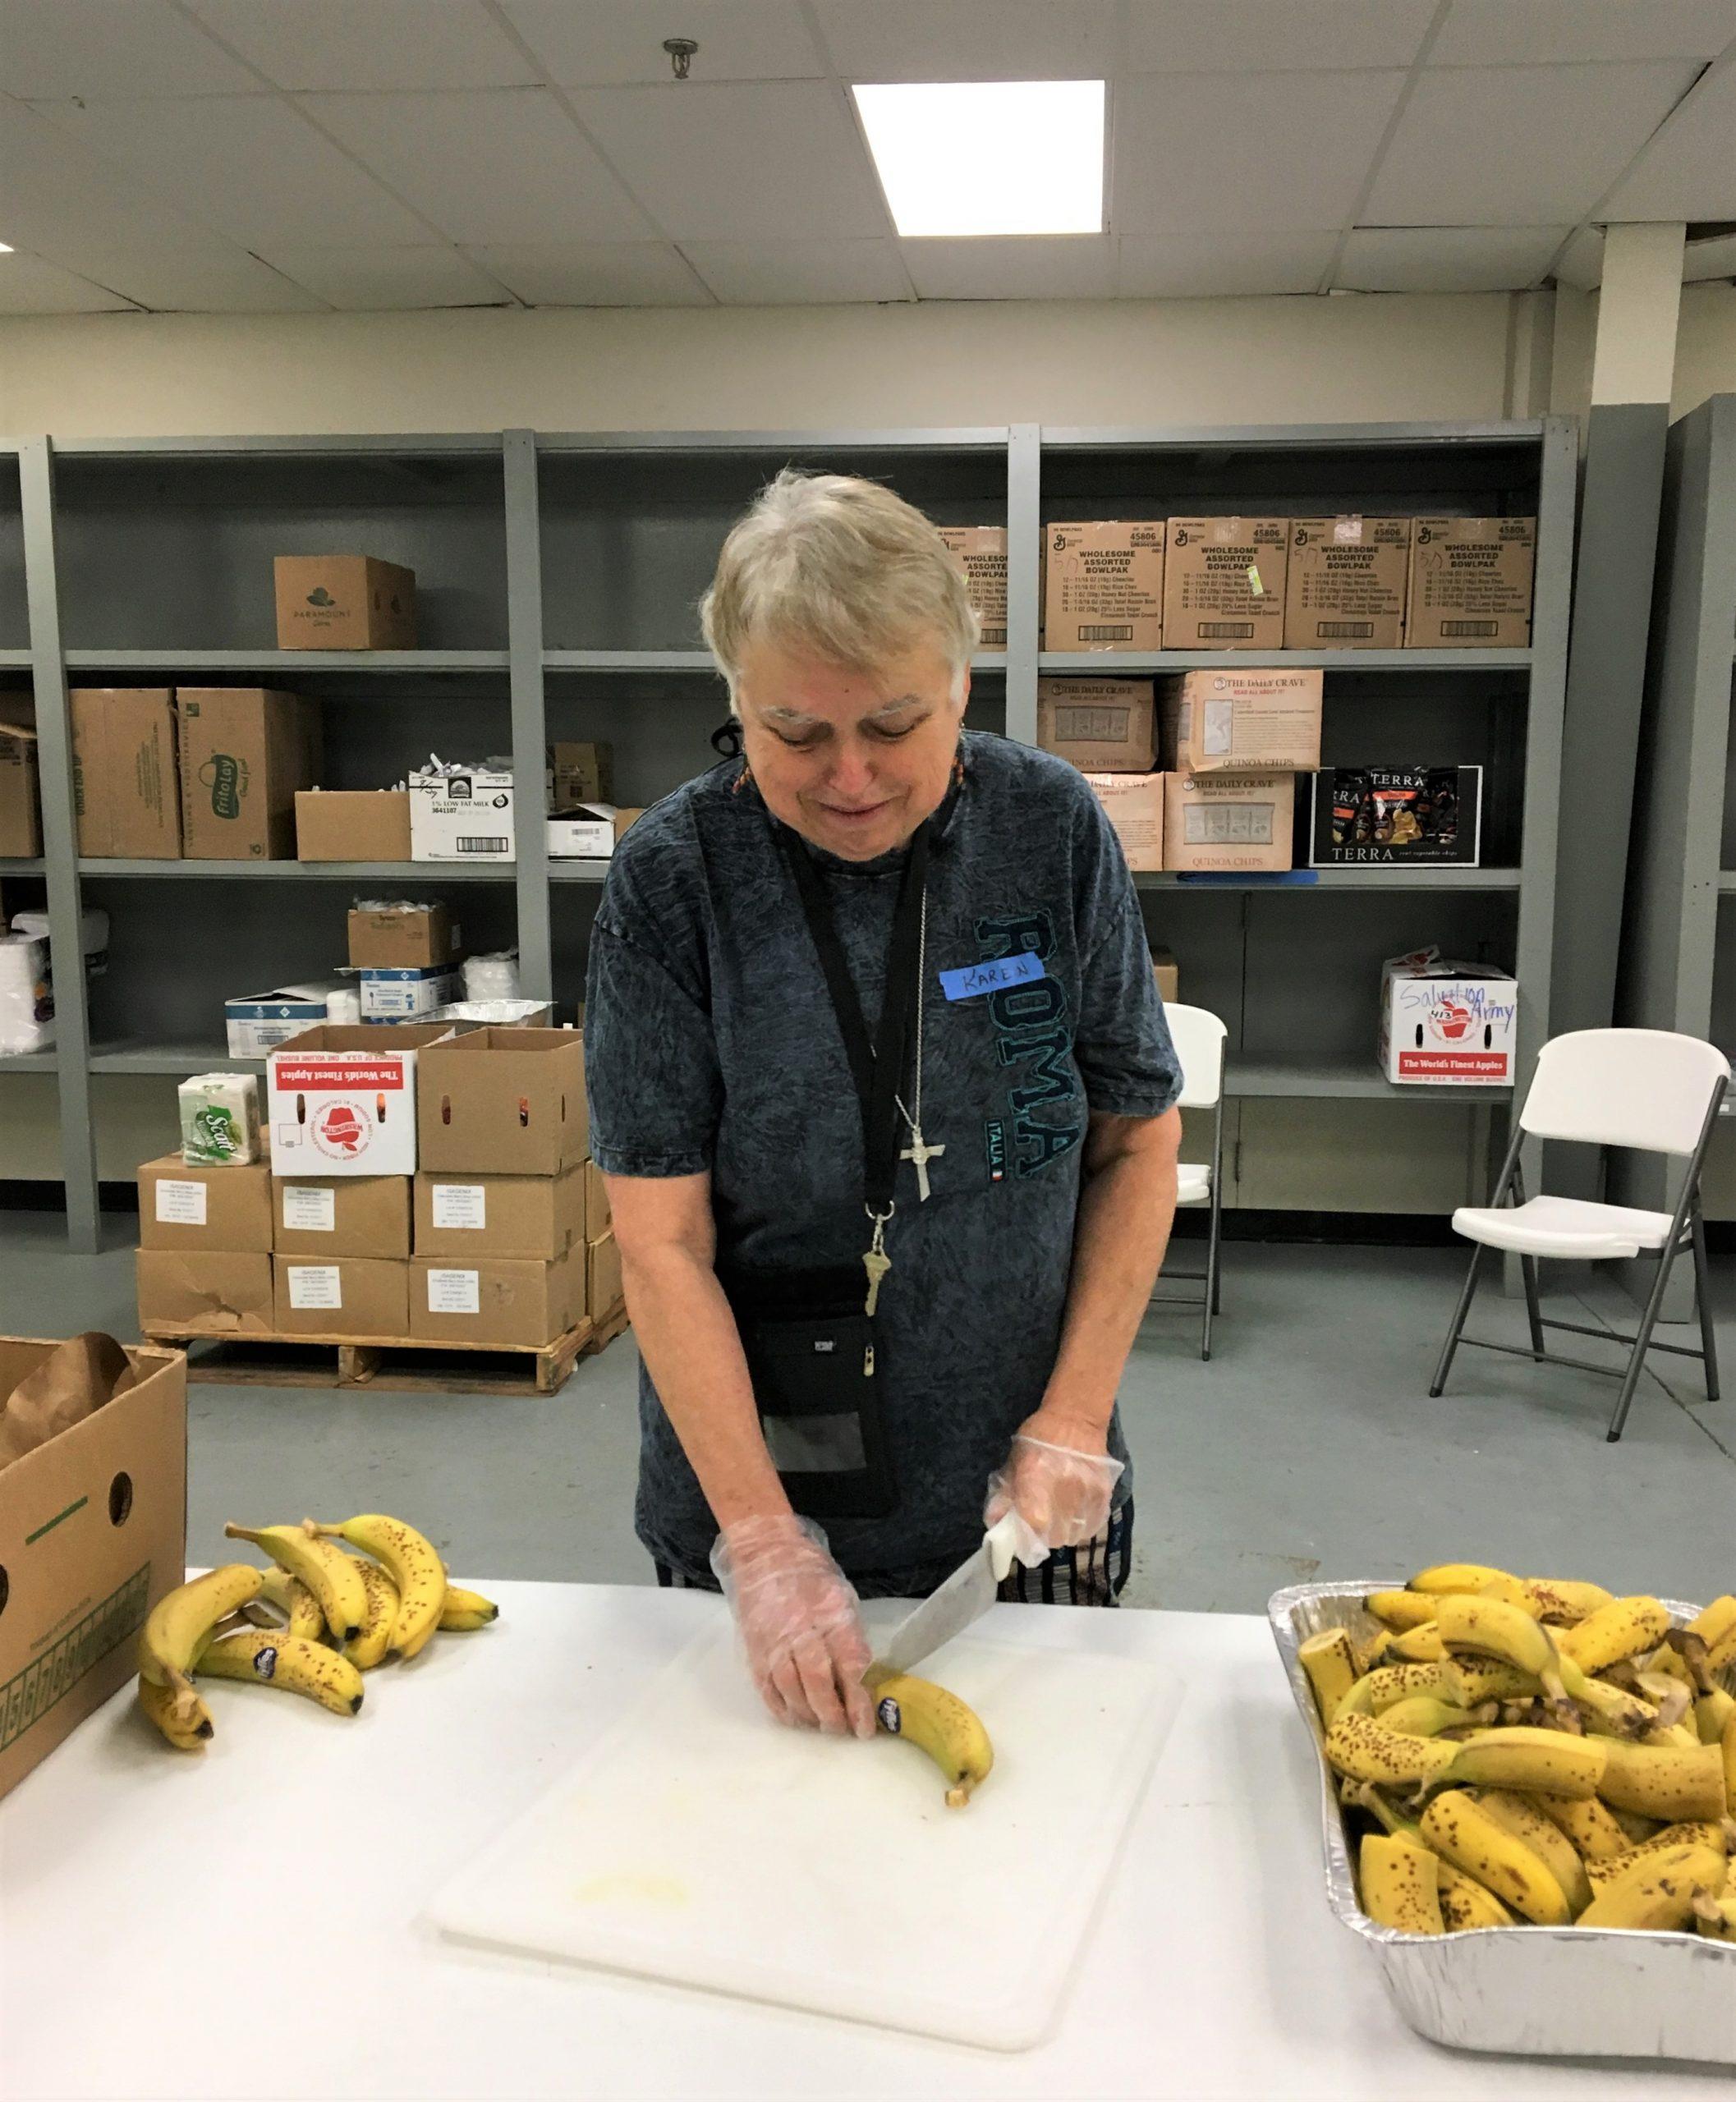 Sister Karen cuts fruit for immigrants at Texas border